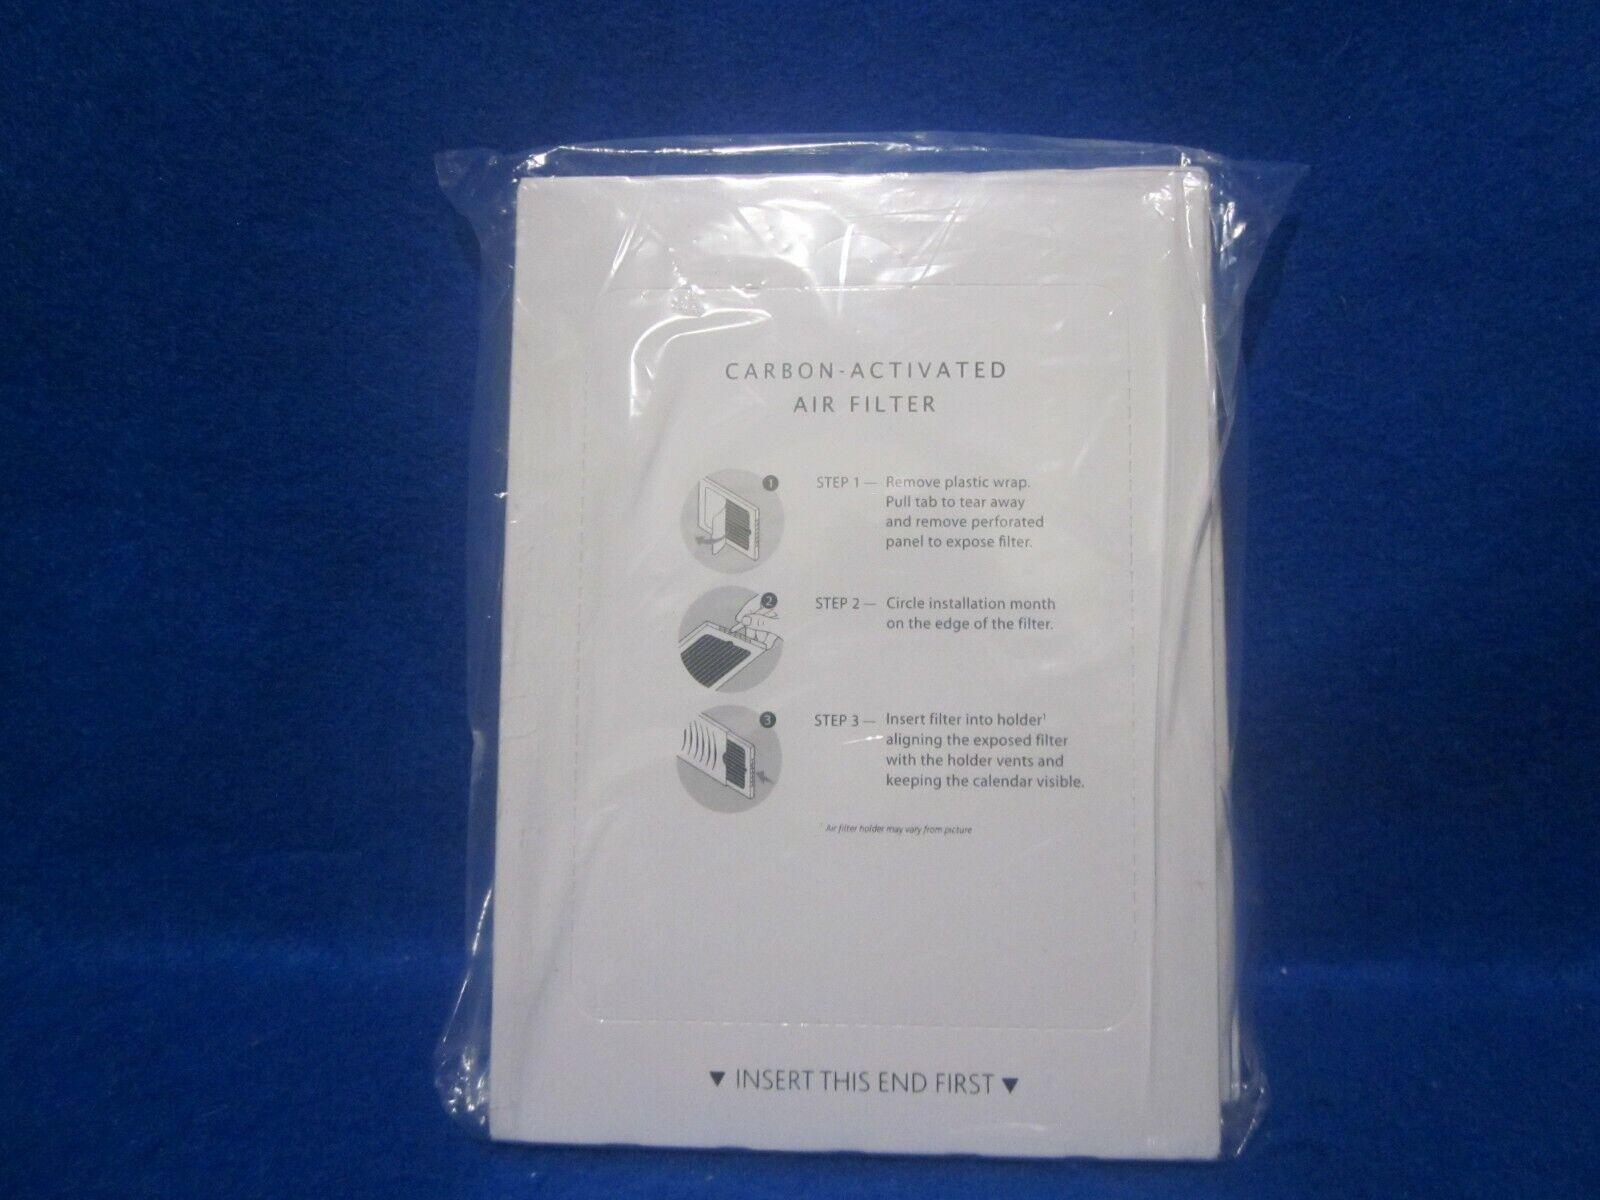 Frigidaire Refrigerator Activated Carbon Air Filter - Black,